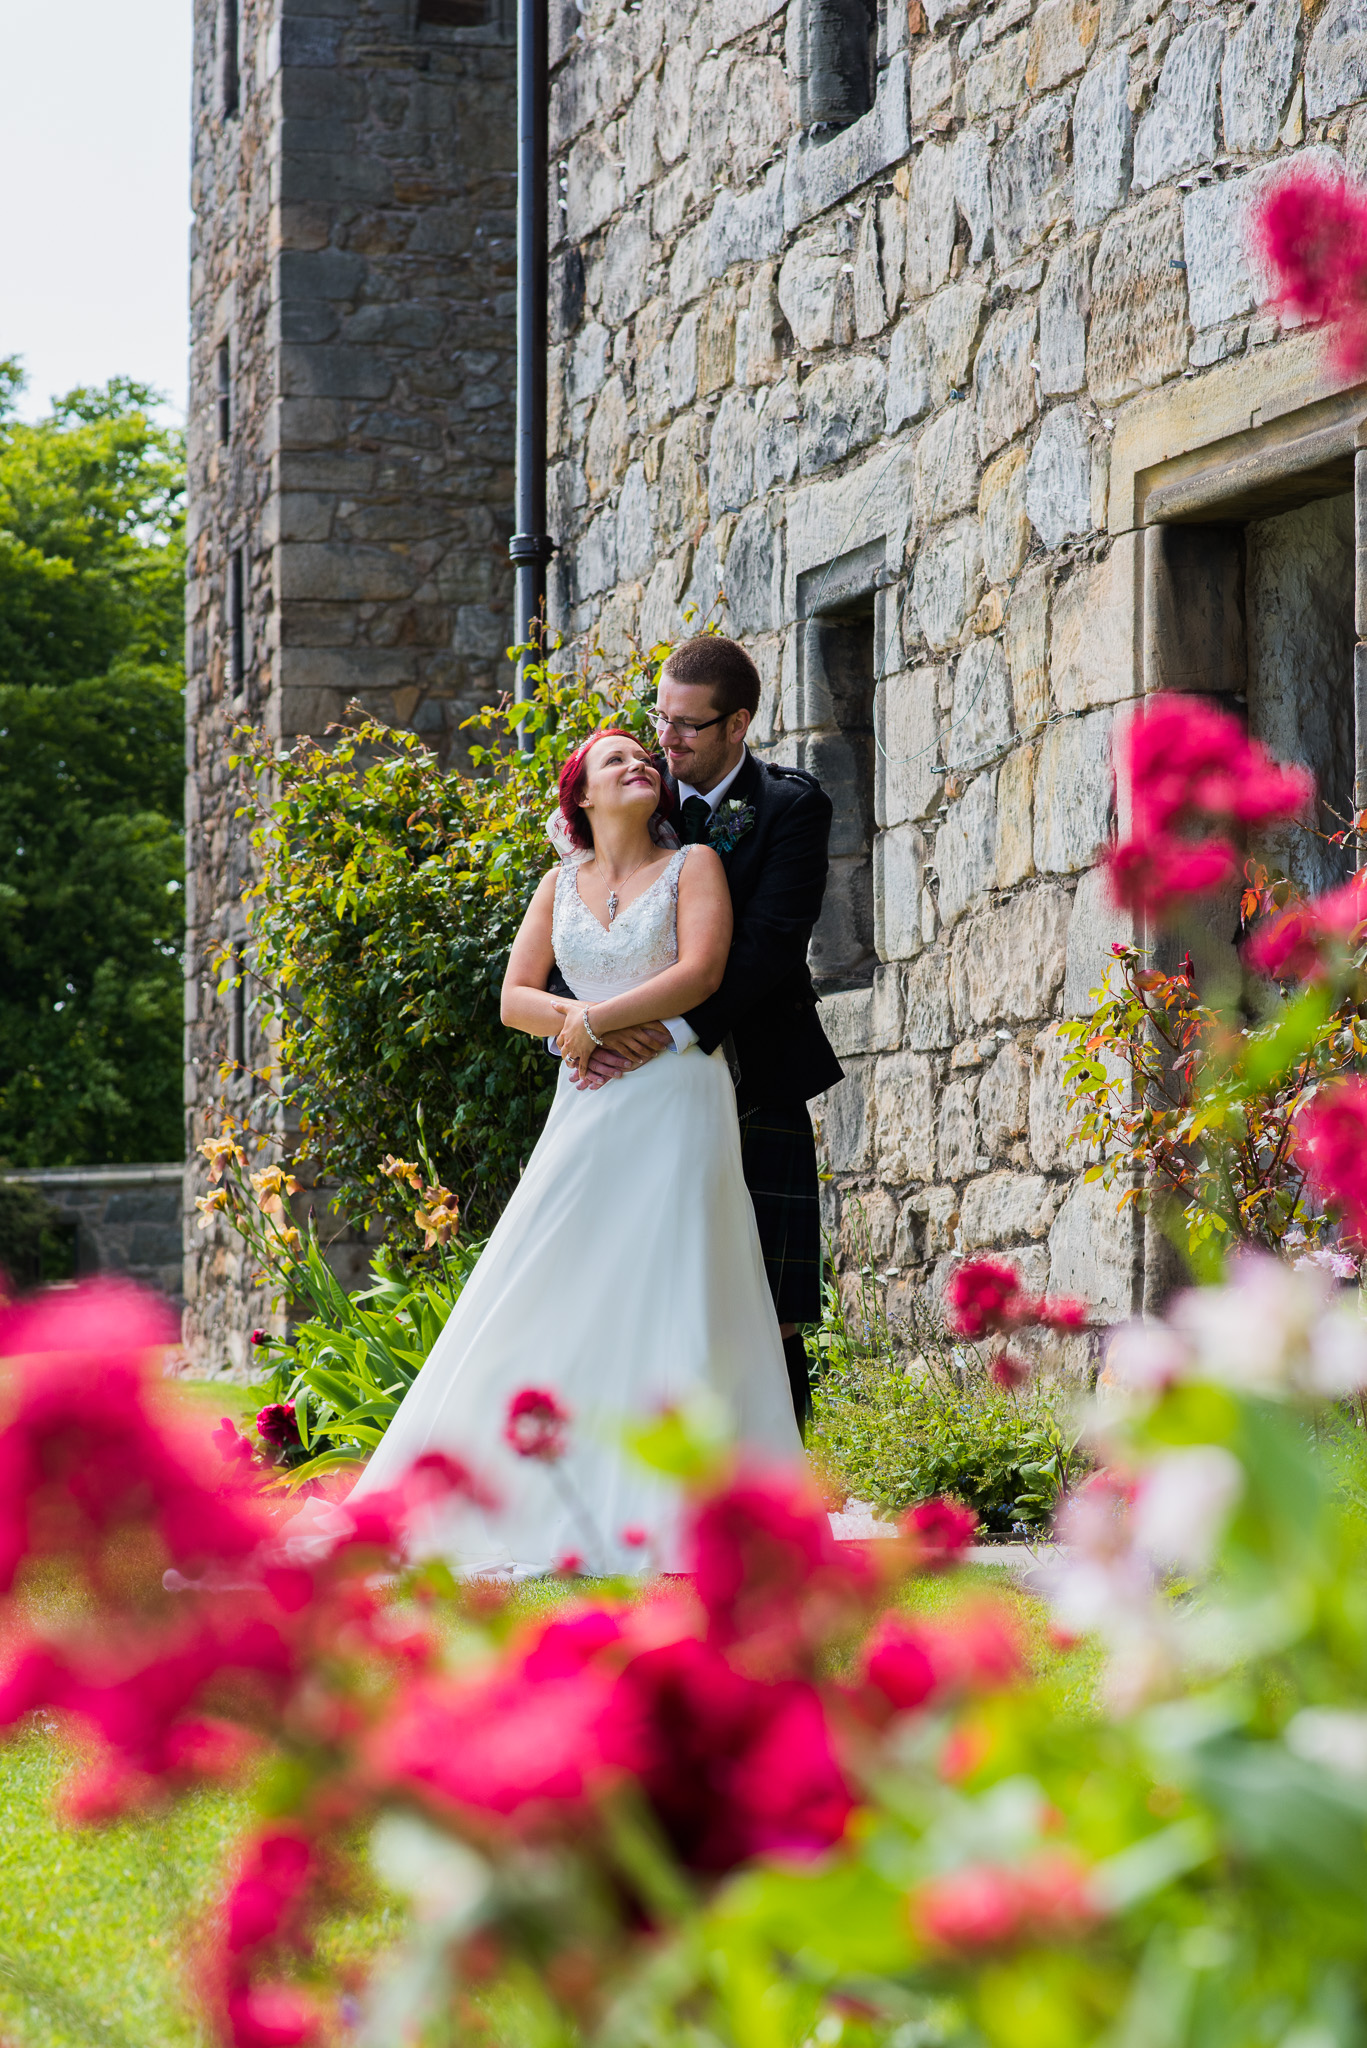 Wedding Couple Aberdour Castle Scotland